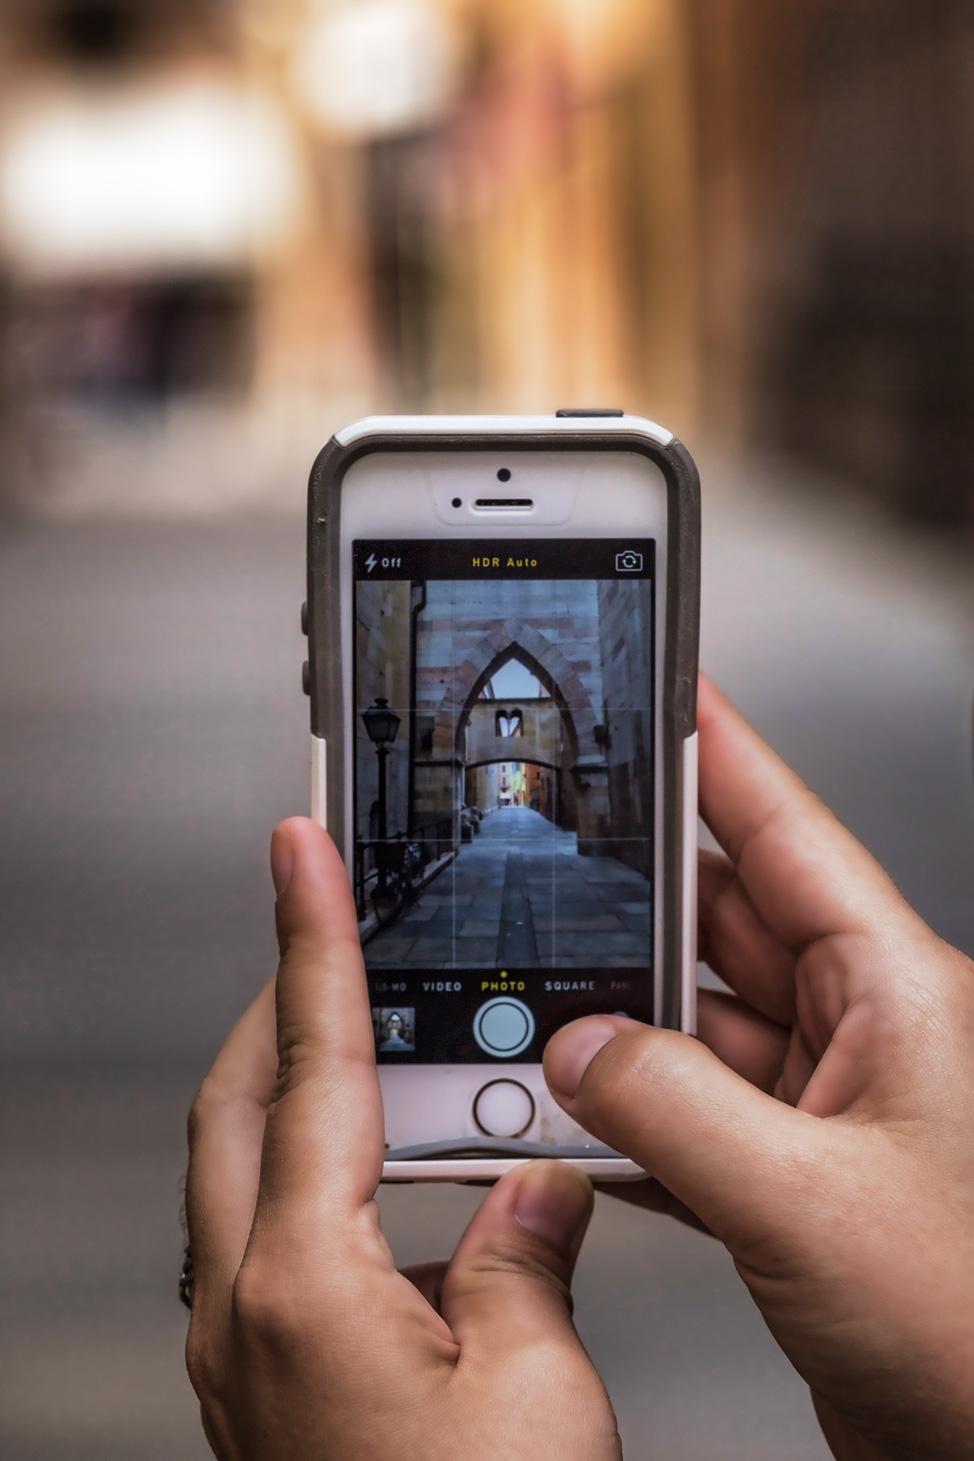 iPhone Modena